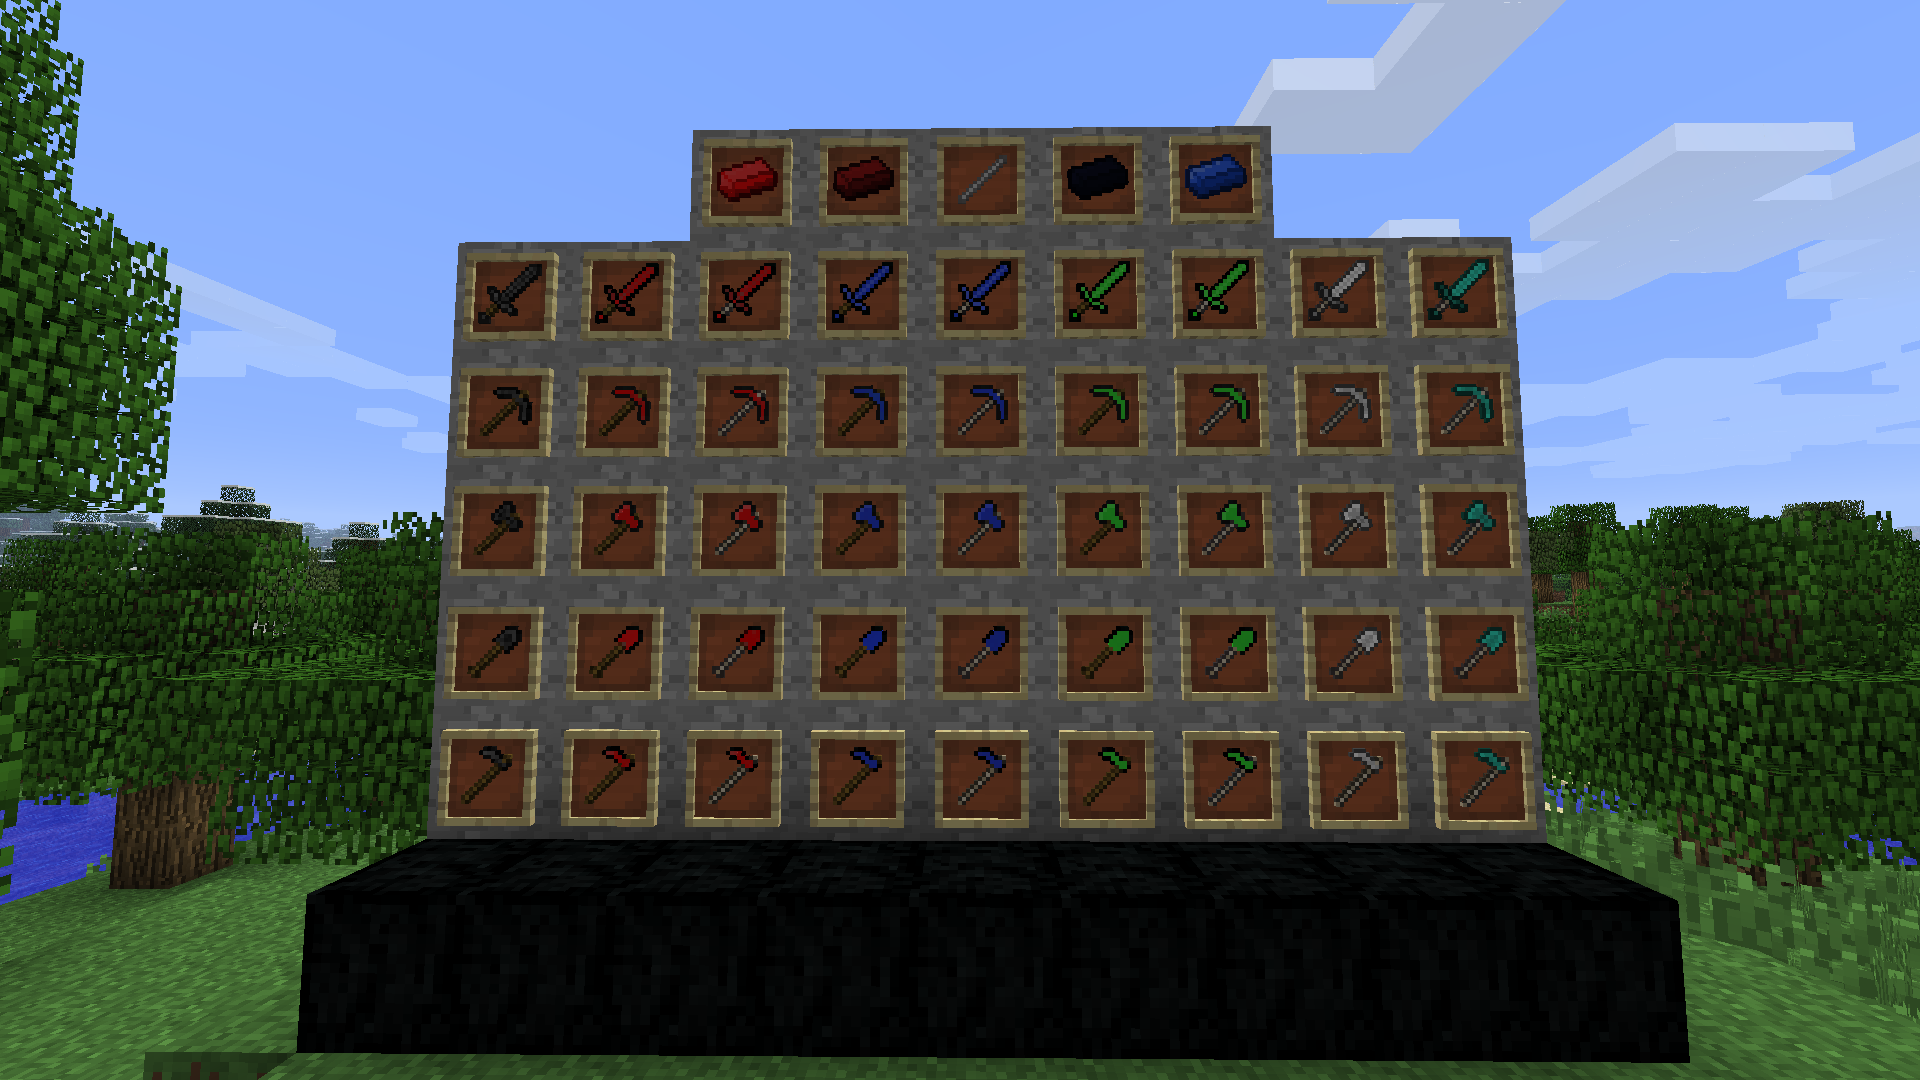 Lapis lazuli house - Minecraft Forums